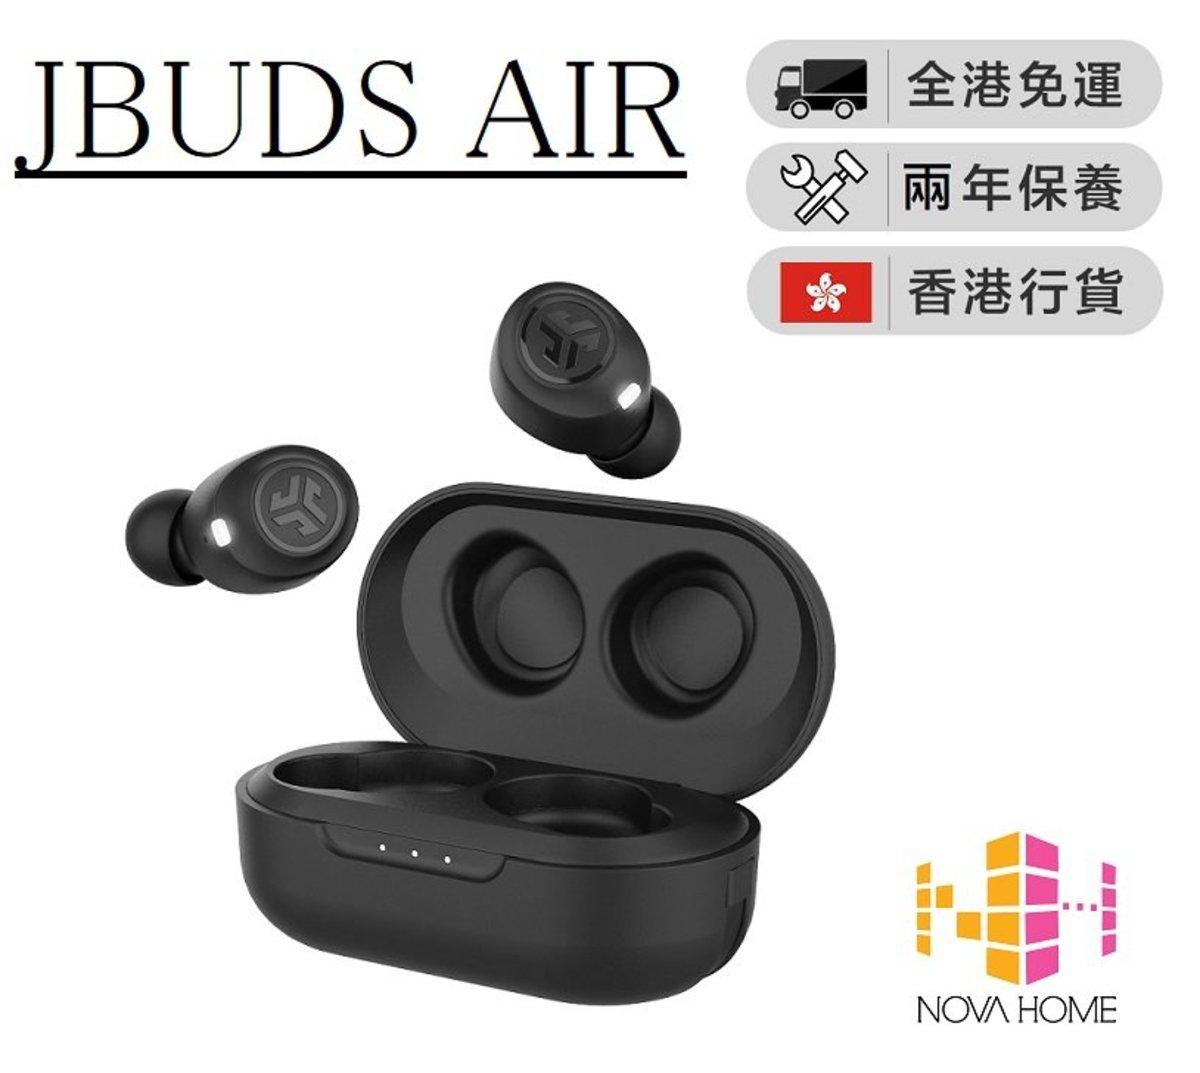 JLab Audio - JBUDS AIR 真無線藍牙5.0防水耳機 黑色